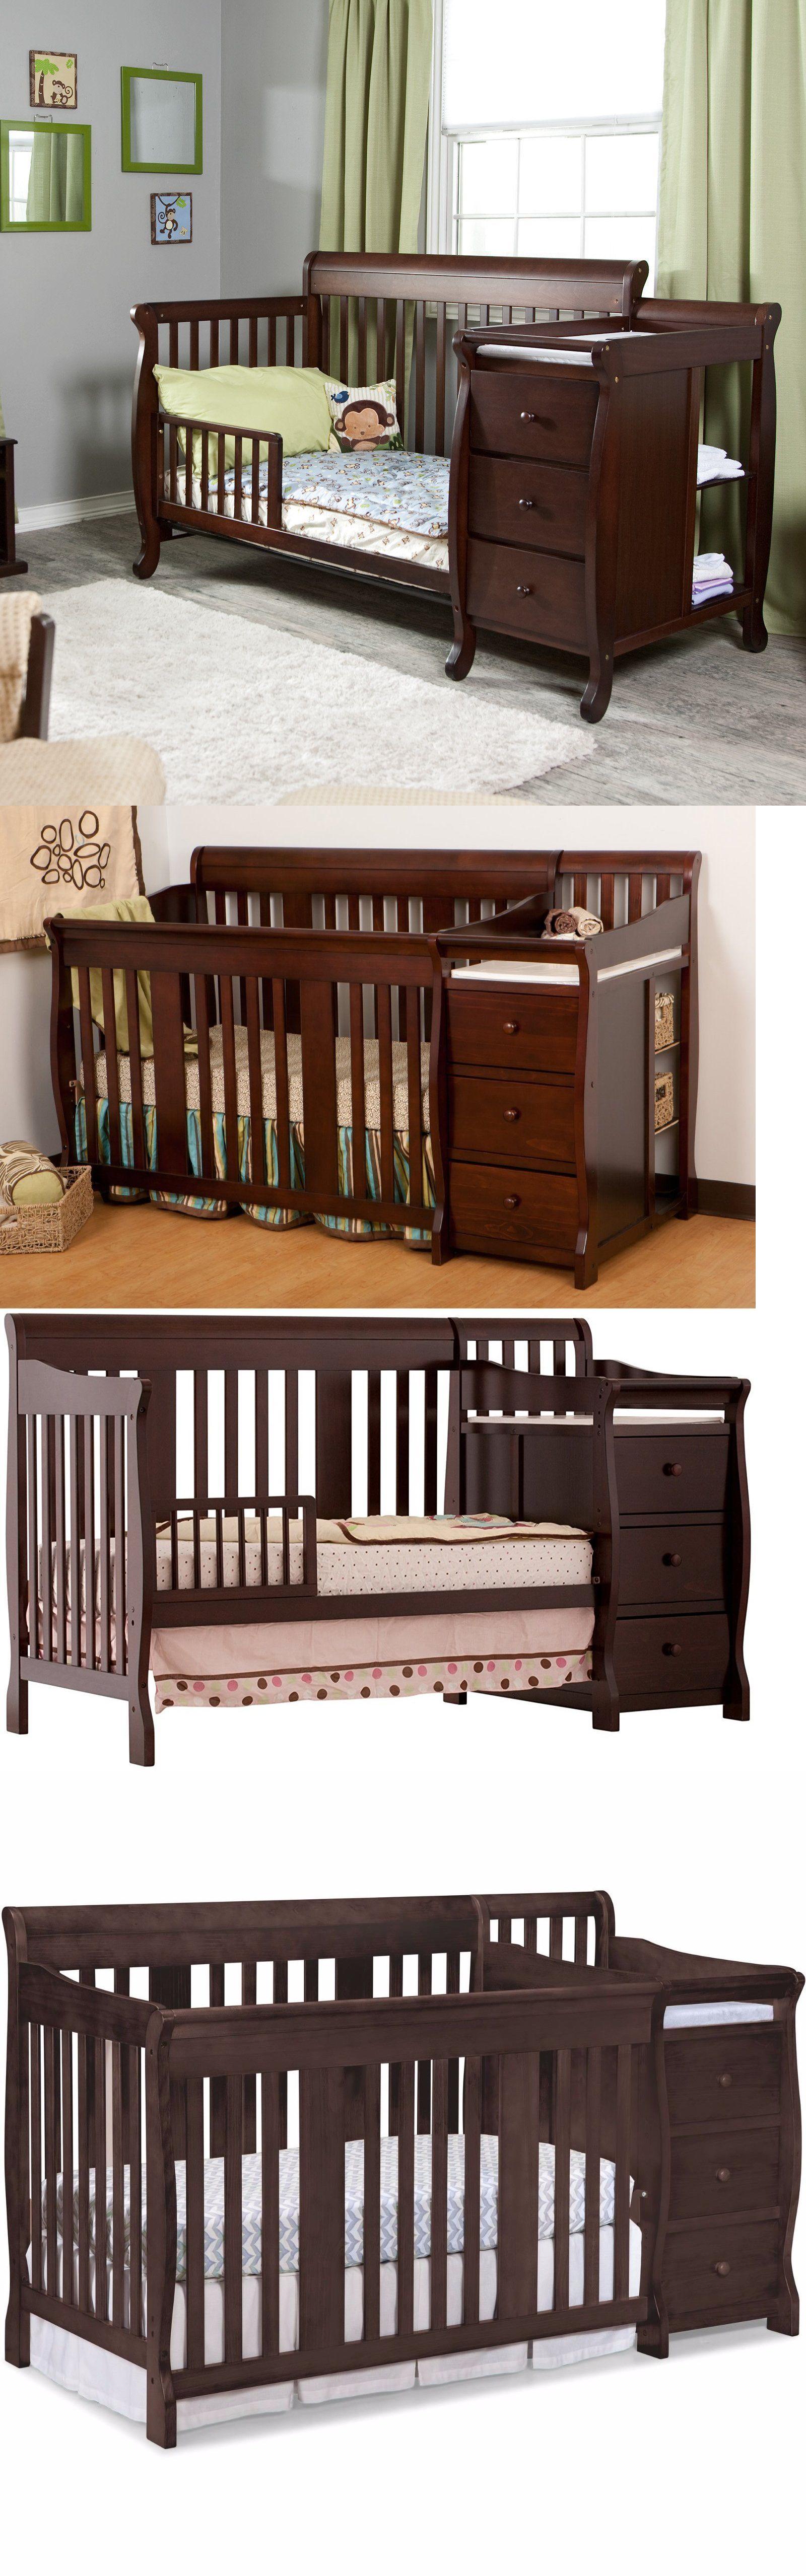 in your children cribs baby of delta dream s new urban classic crib coil choose mattress convertible